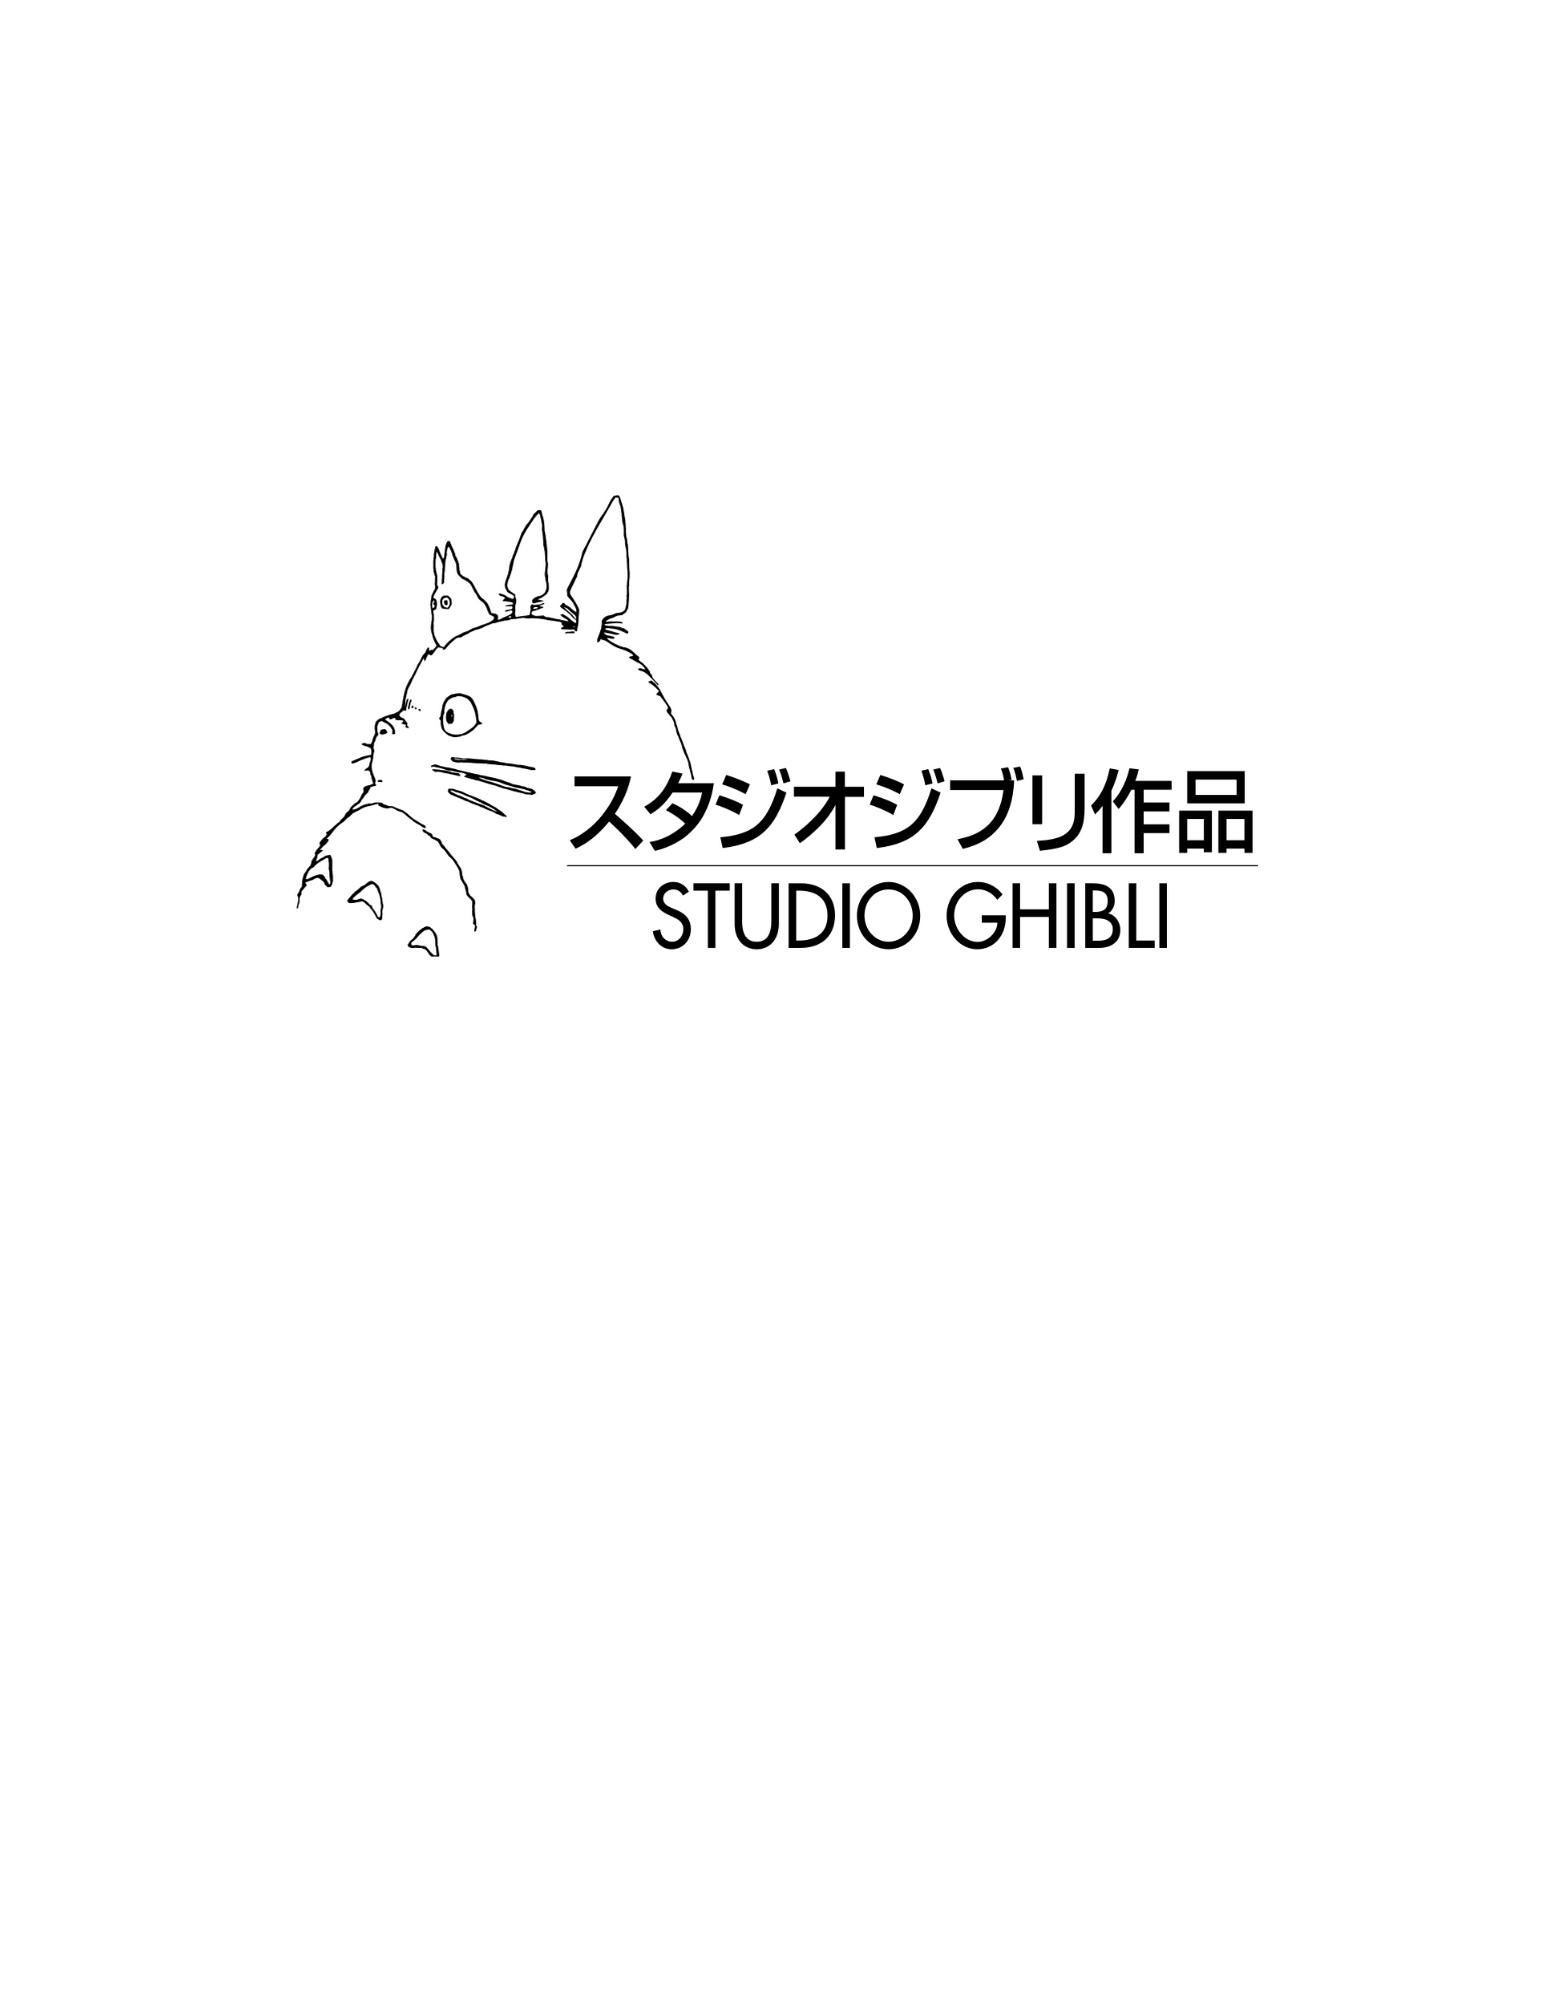 Studio Ghibli White Background Studio Ghibli White Background Studio